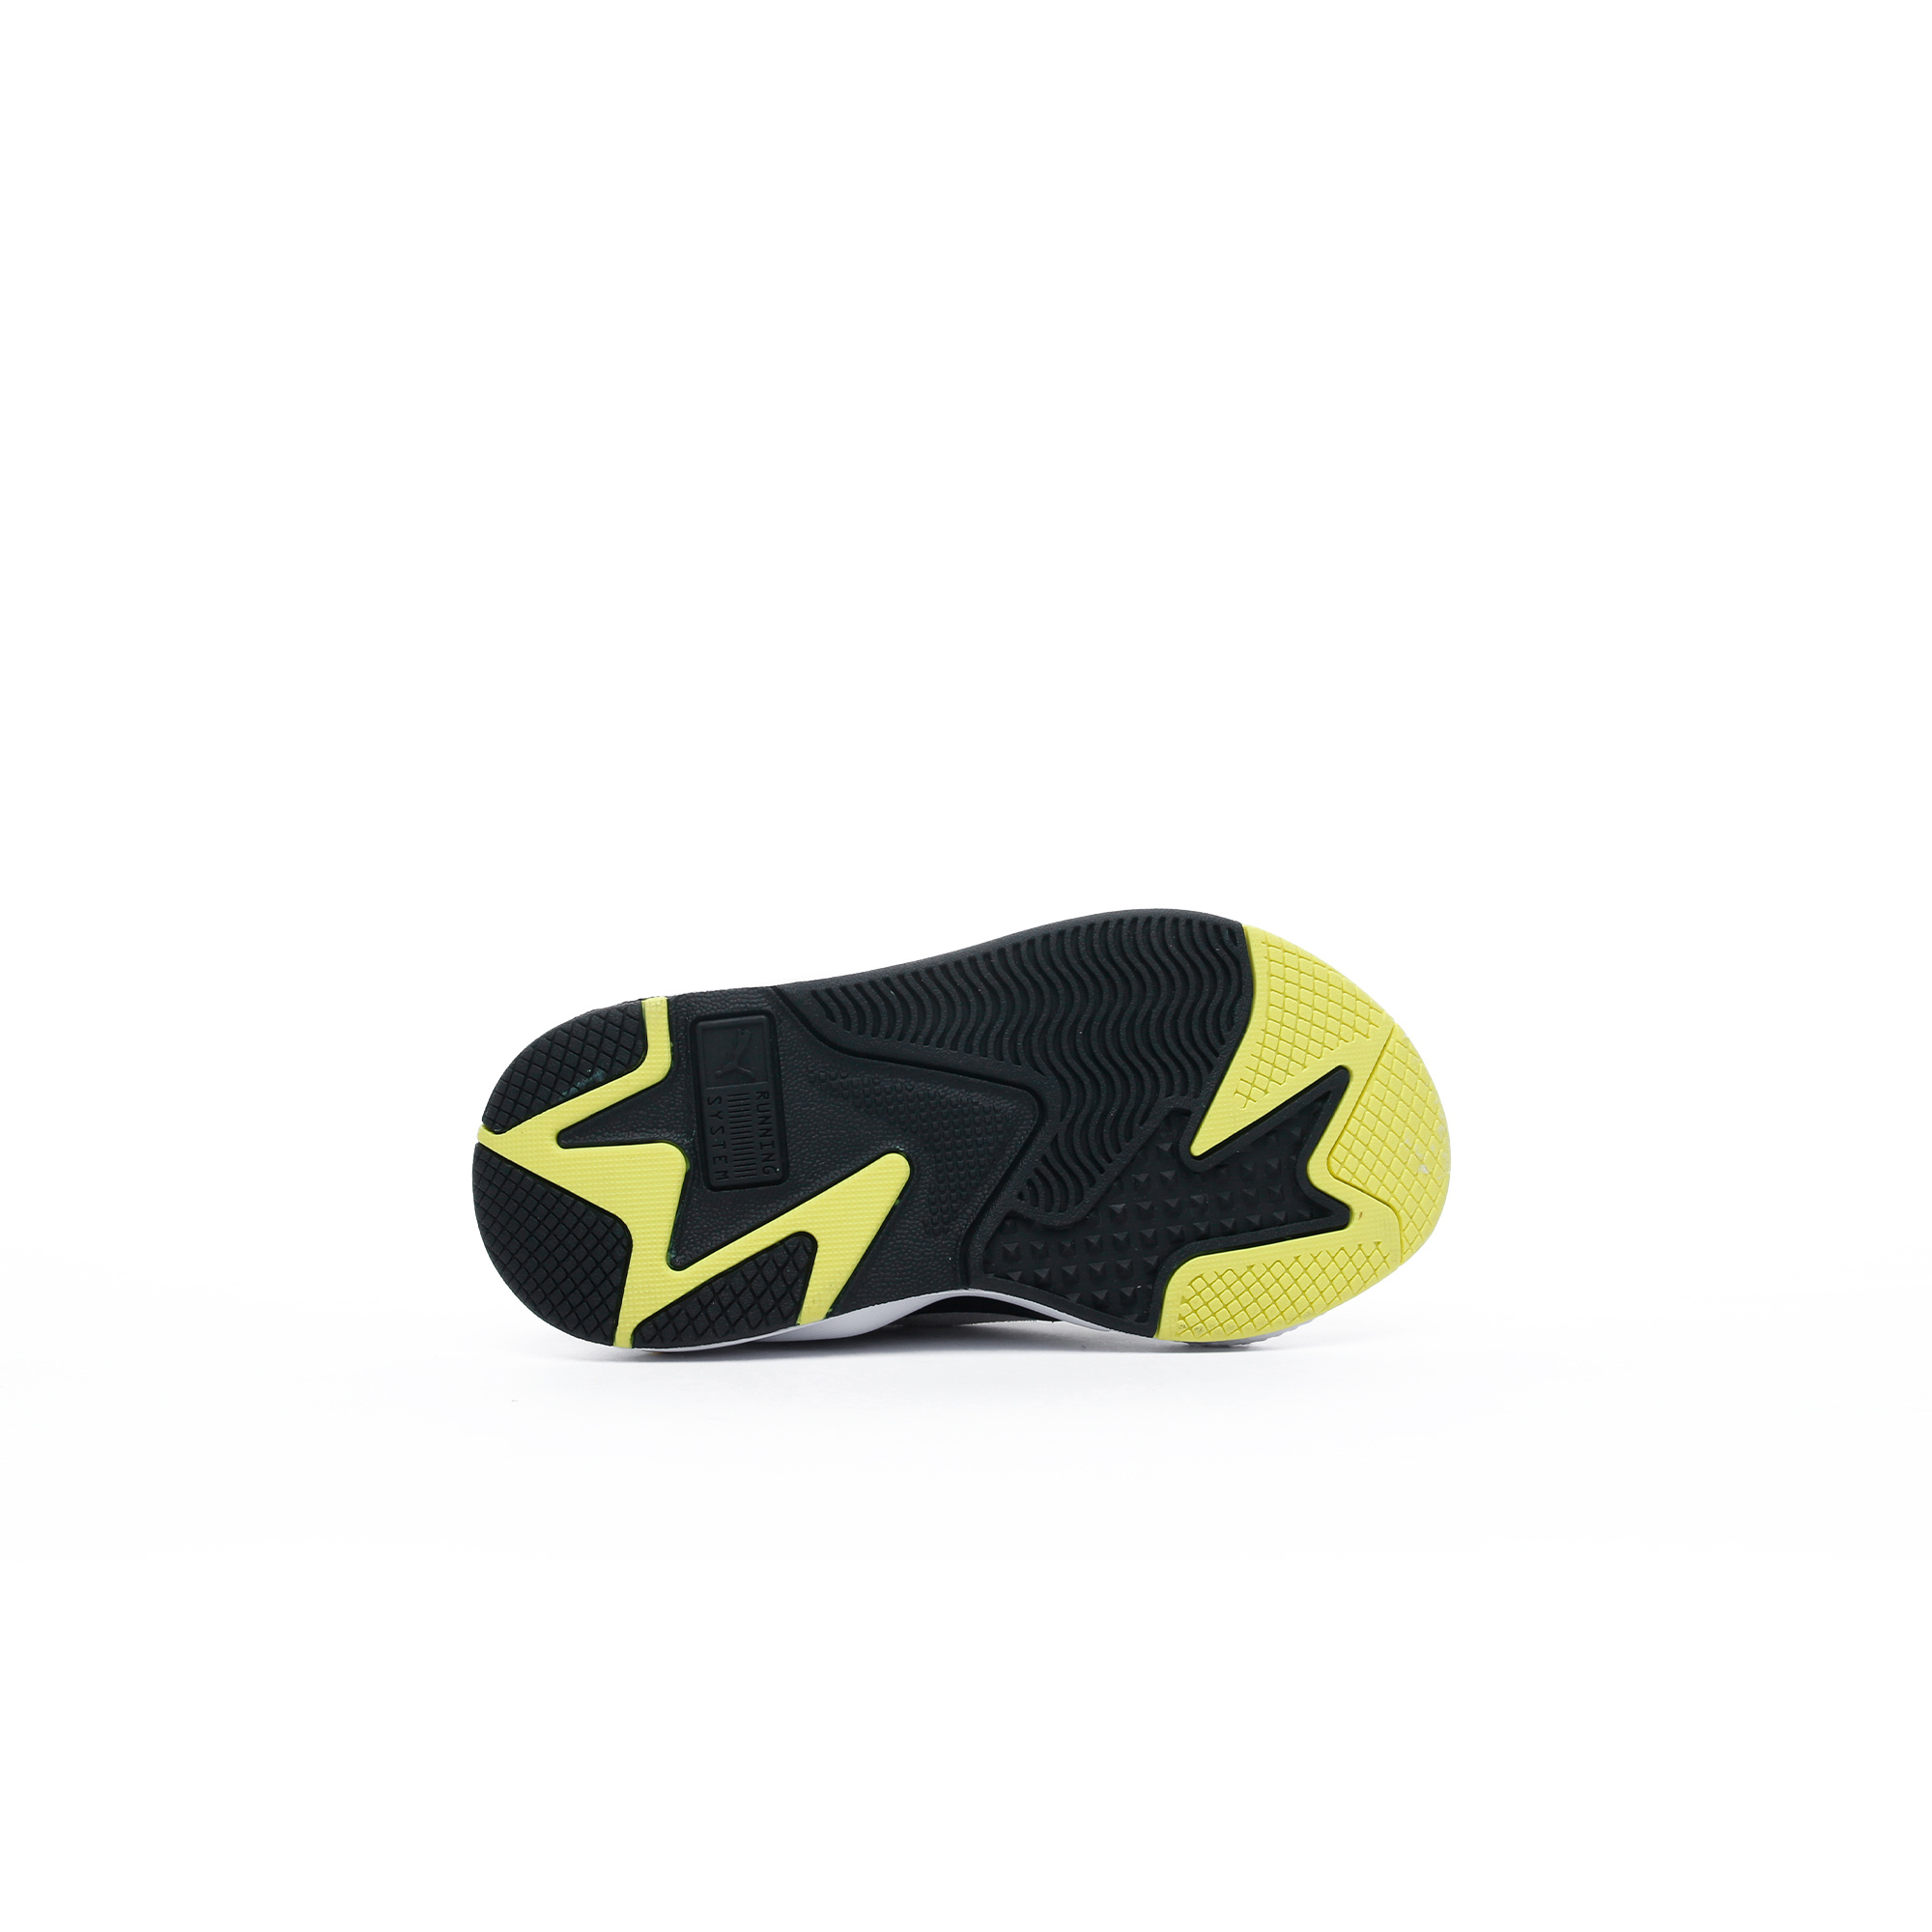 Puma RS X³ x Emoji PS Siyah Çocuk Spor Ayakkabı